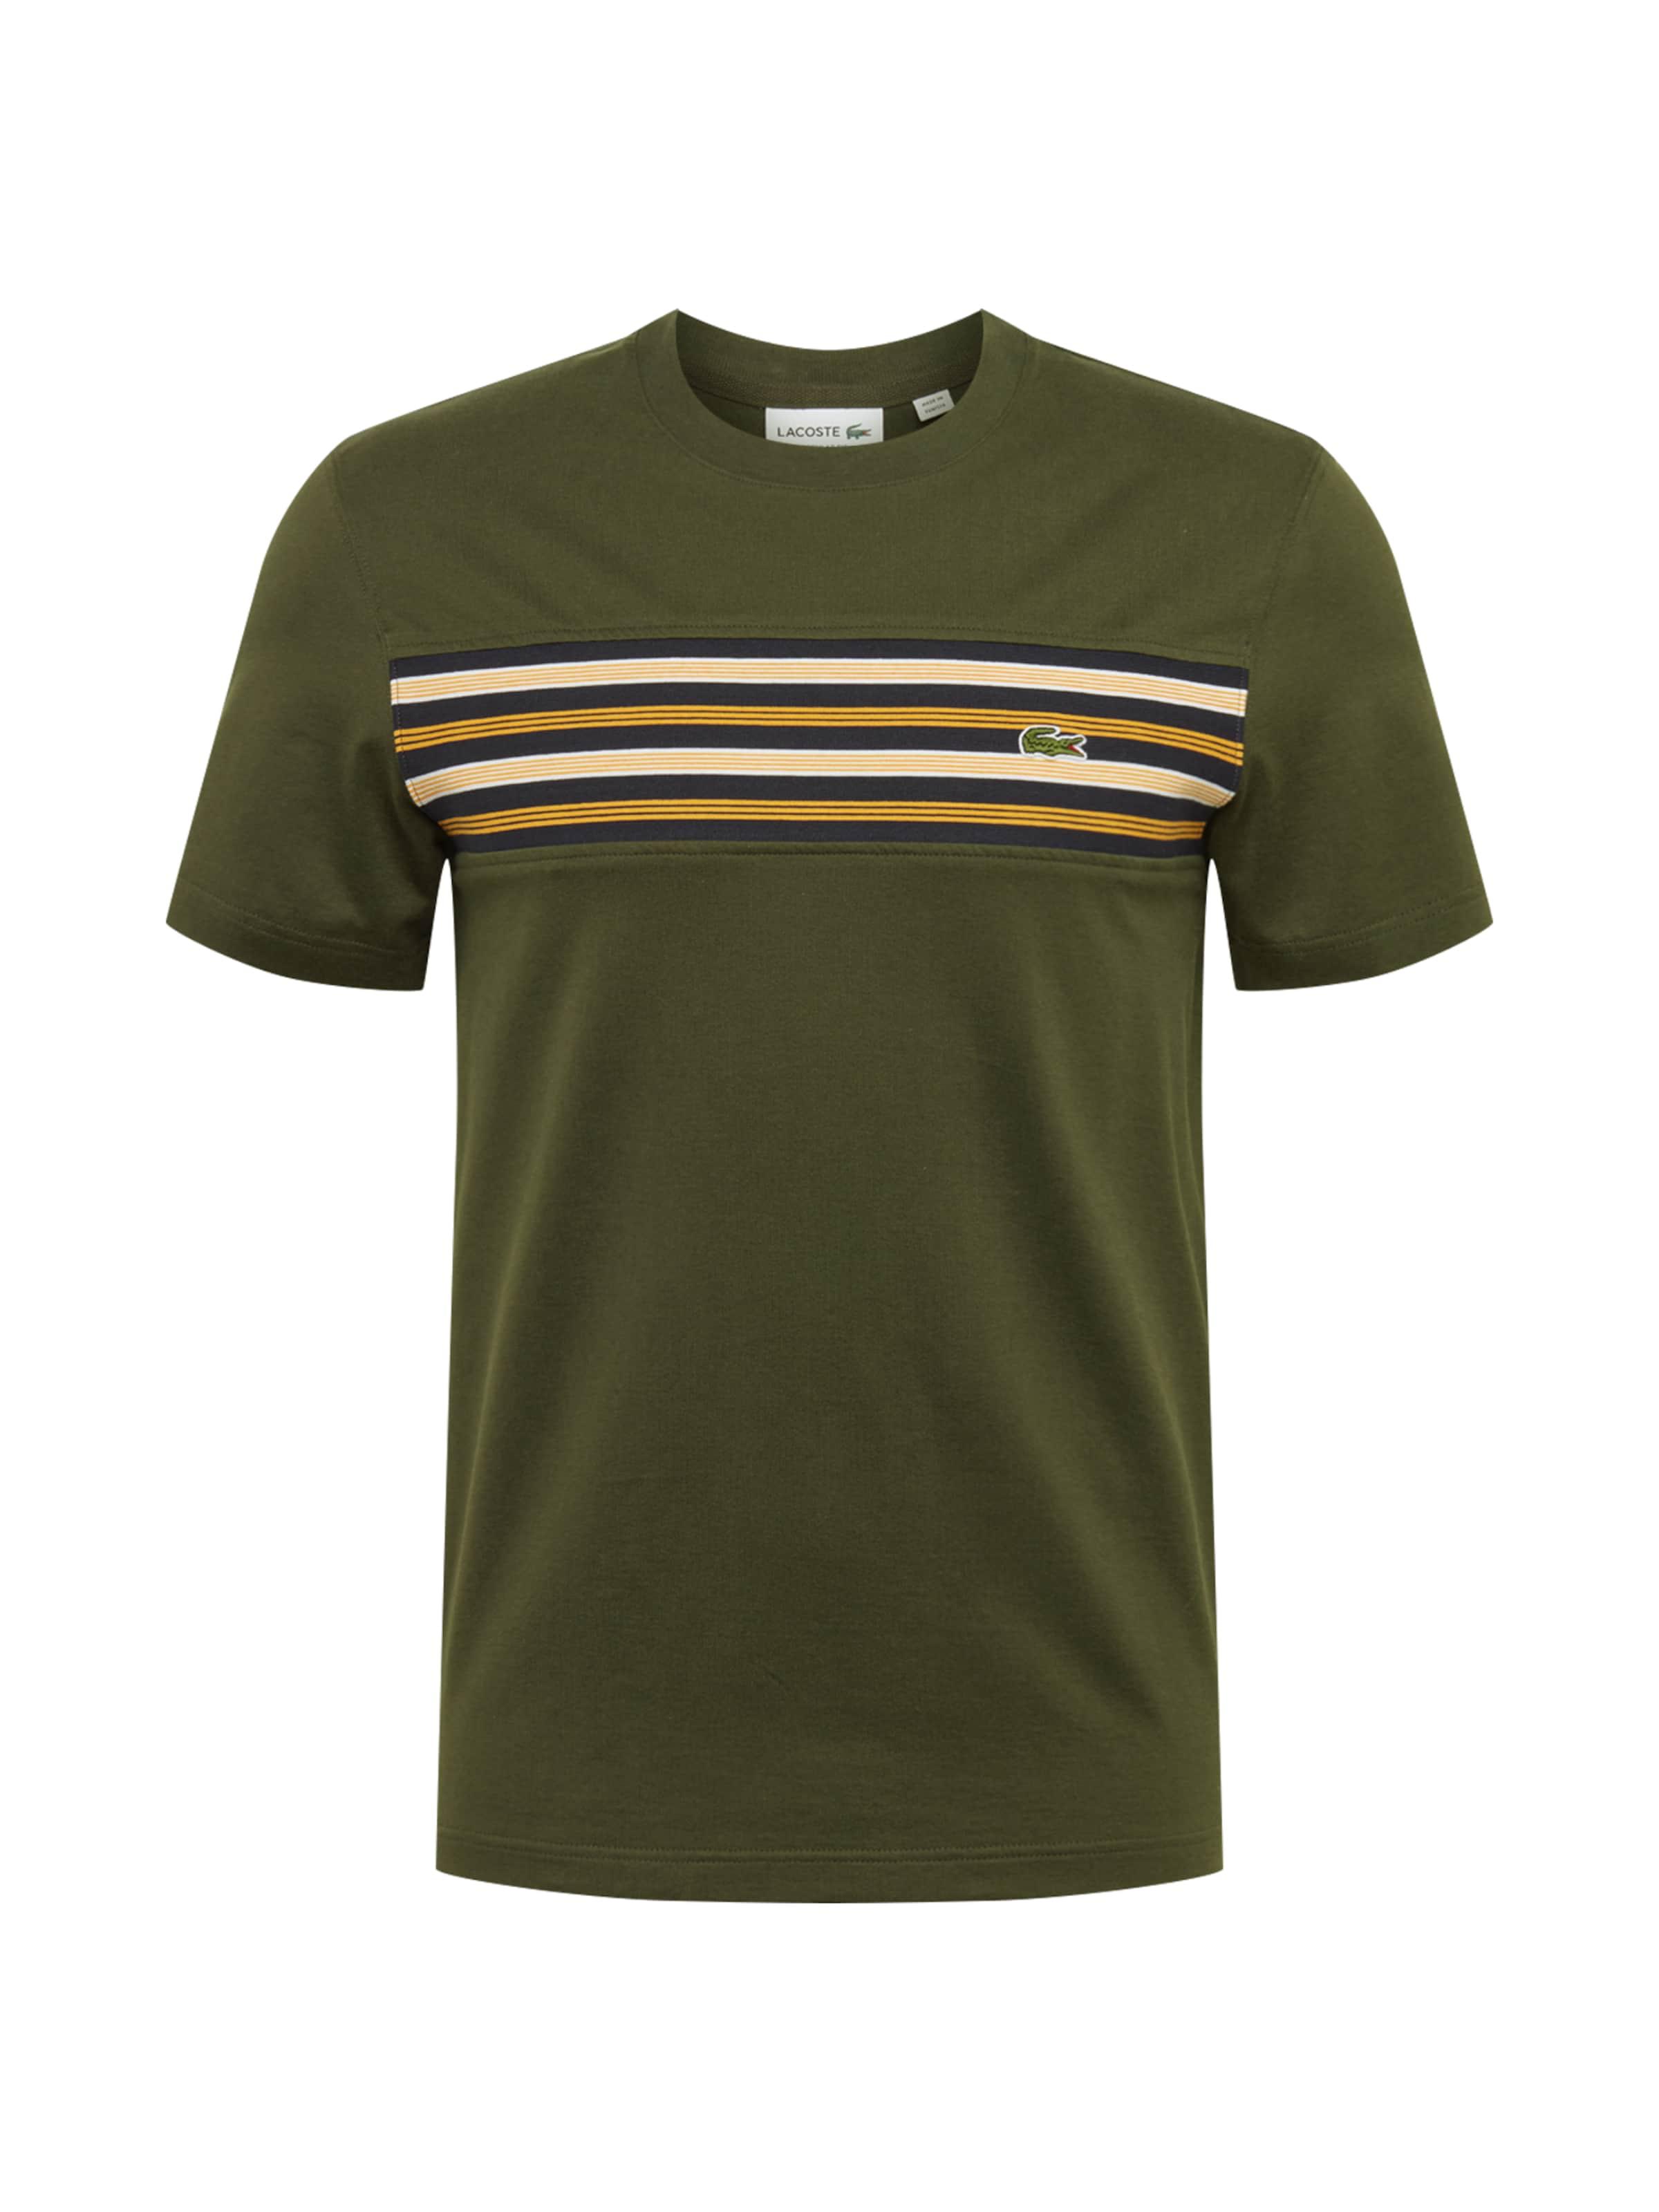 shirt En shirt Lacoste T Olive shirt Lacoste Olive Lacoste T En T Nm0v8nwO